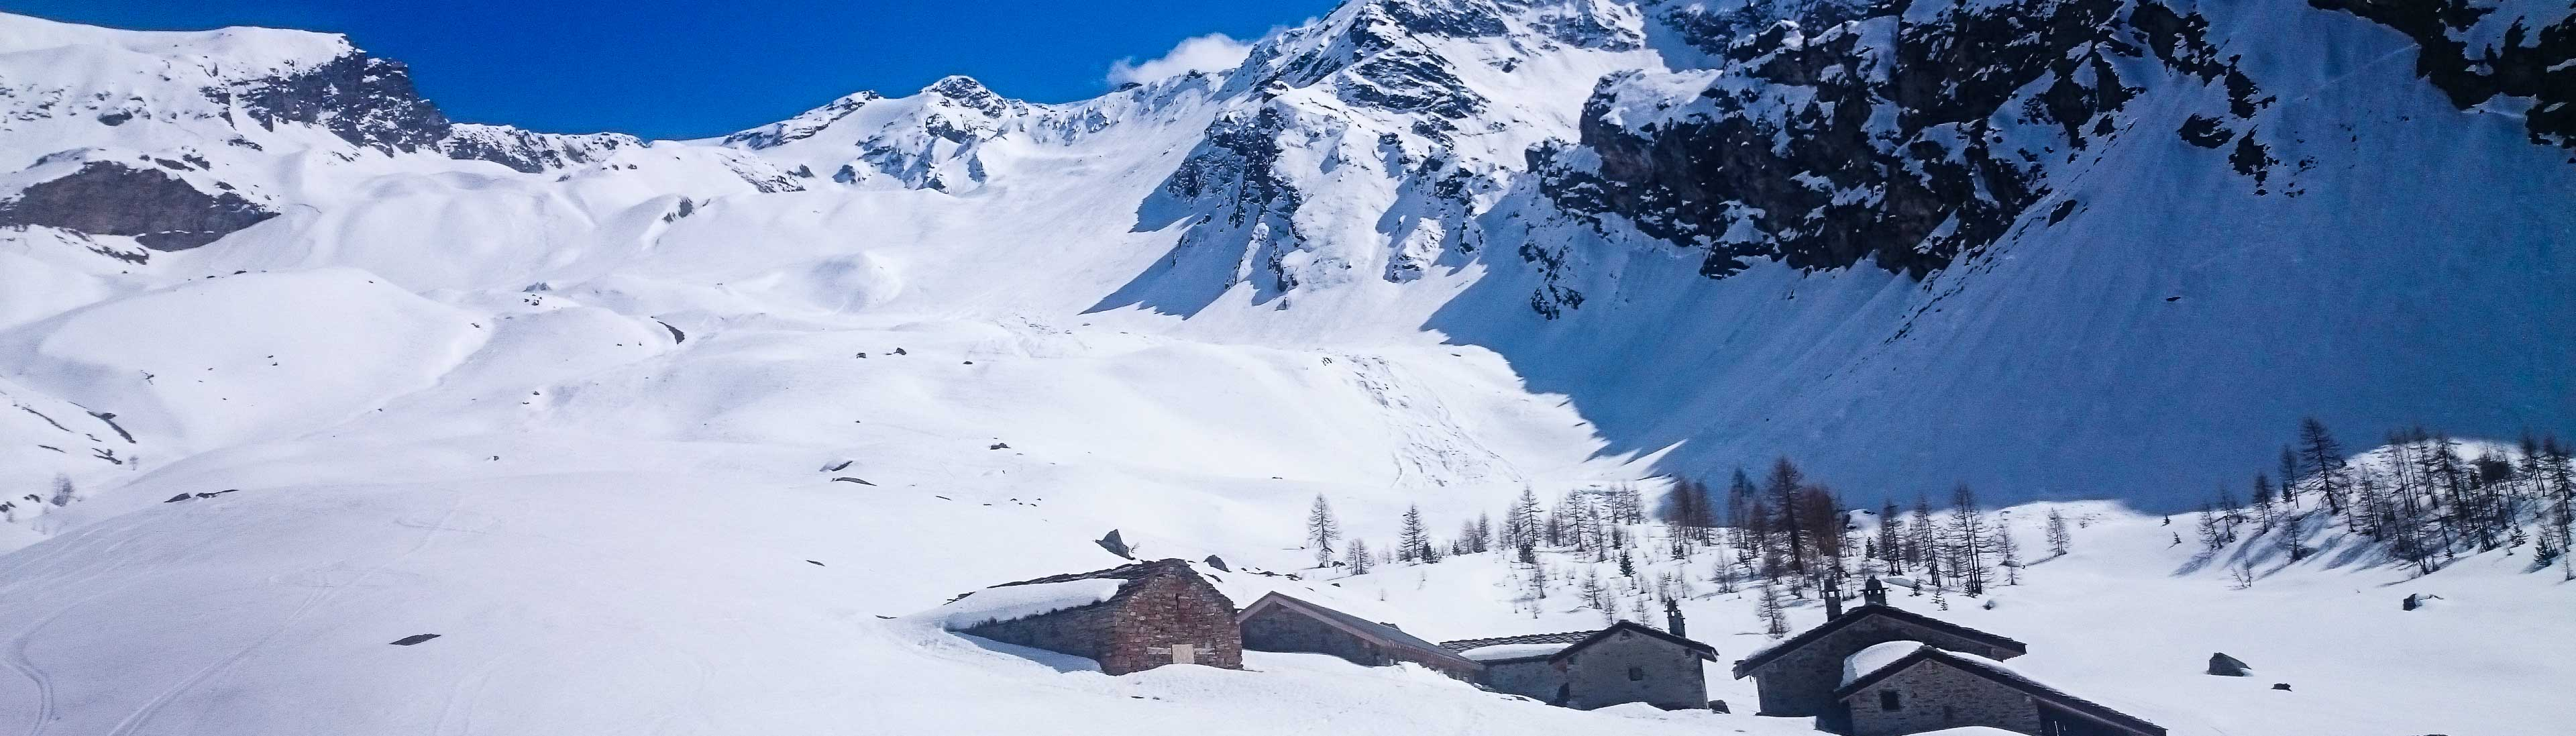 Skidurchquerung Gran Paradiso